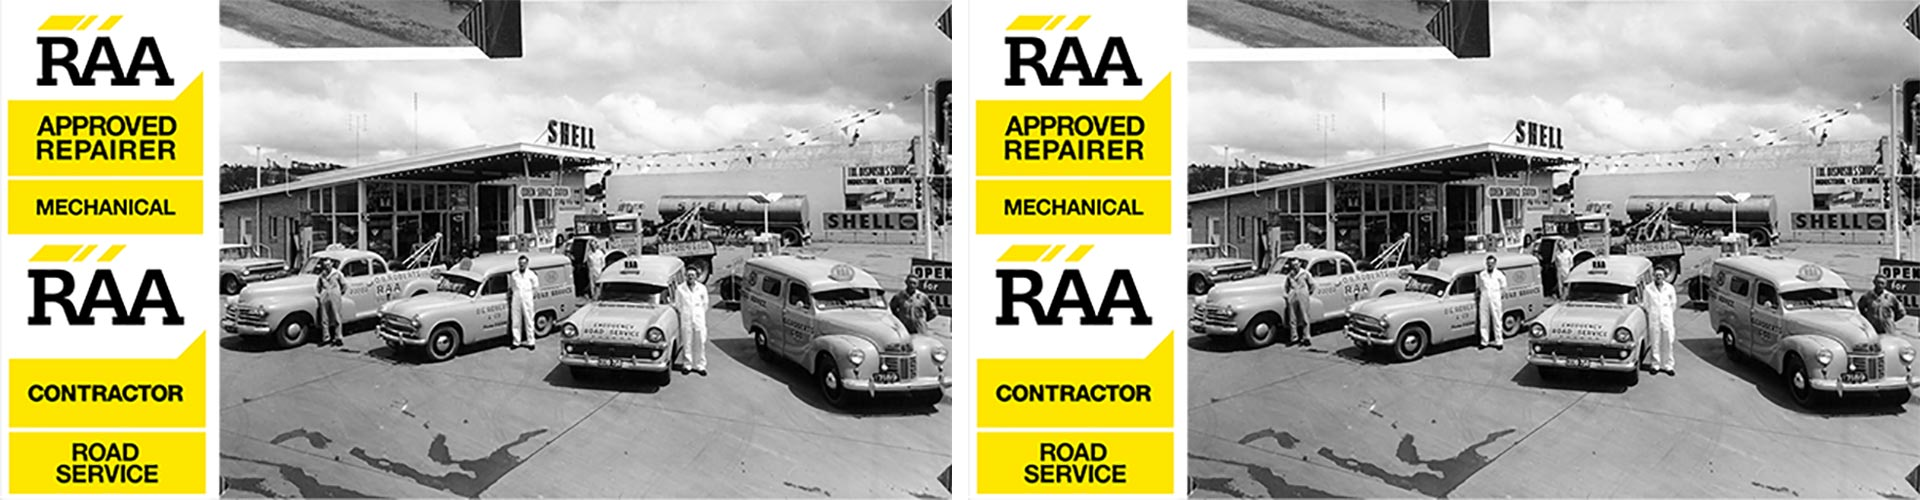 O G R RAA Roadside Assistance